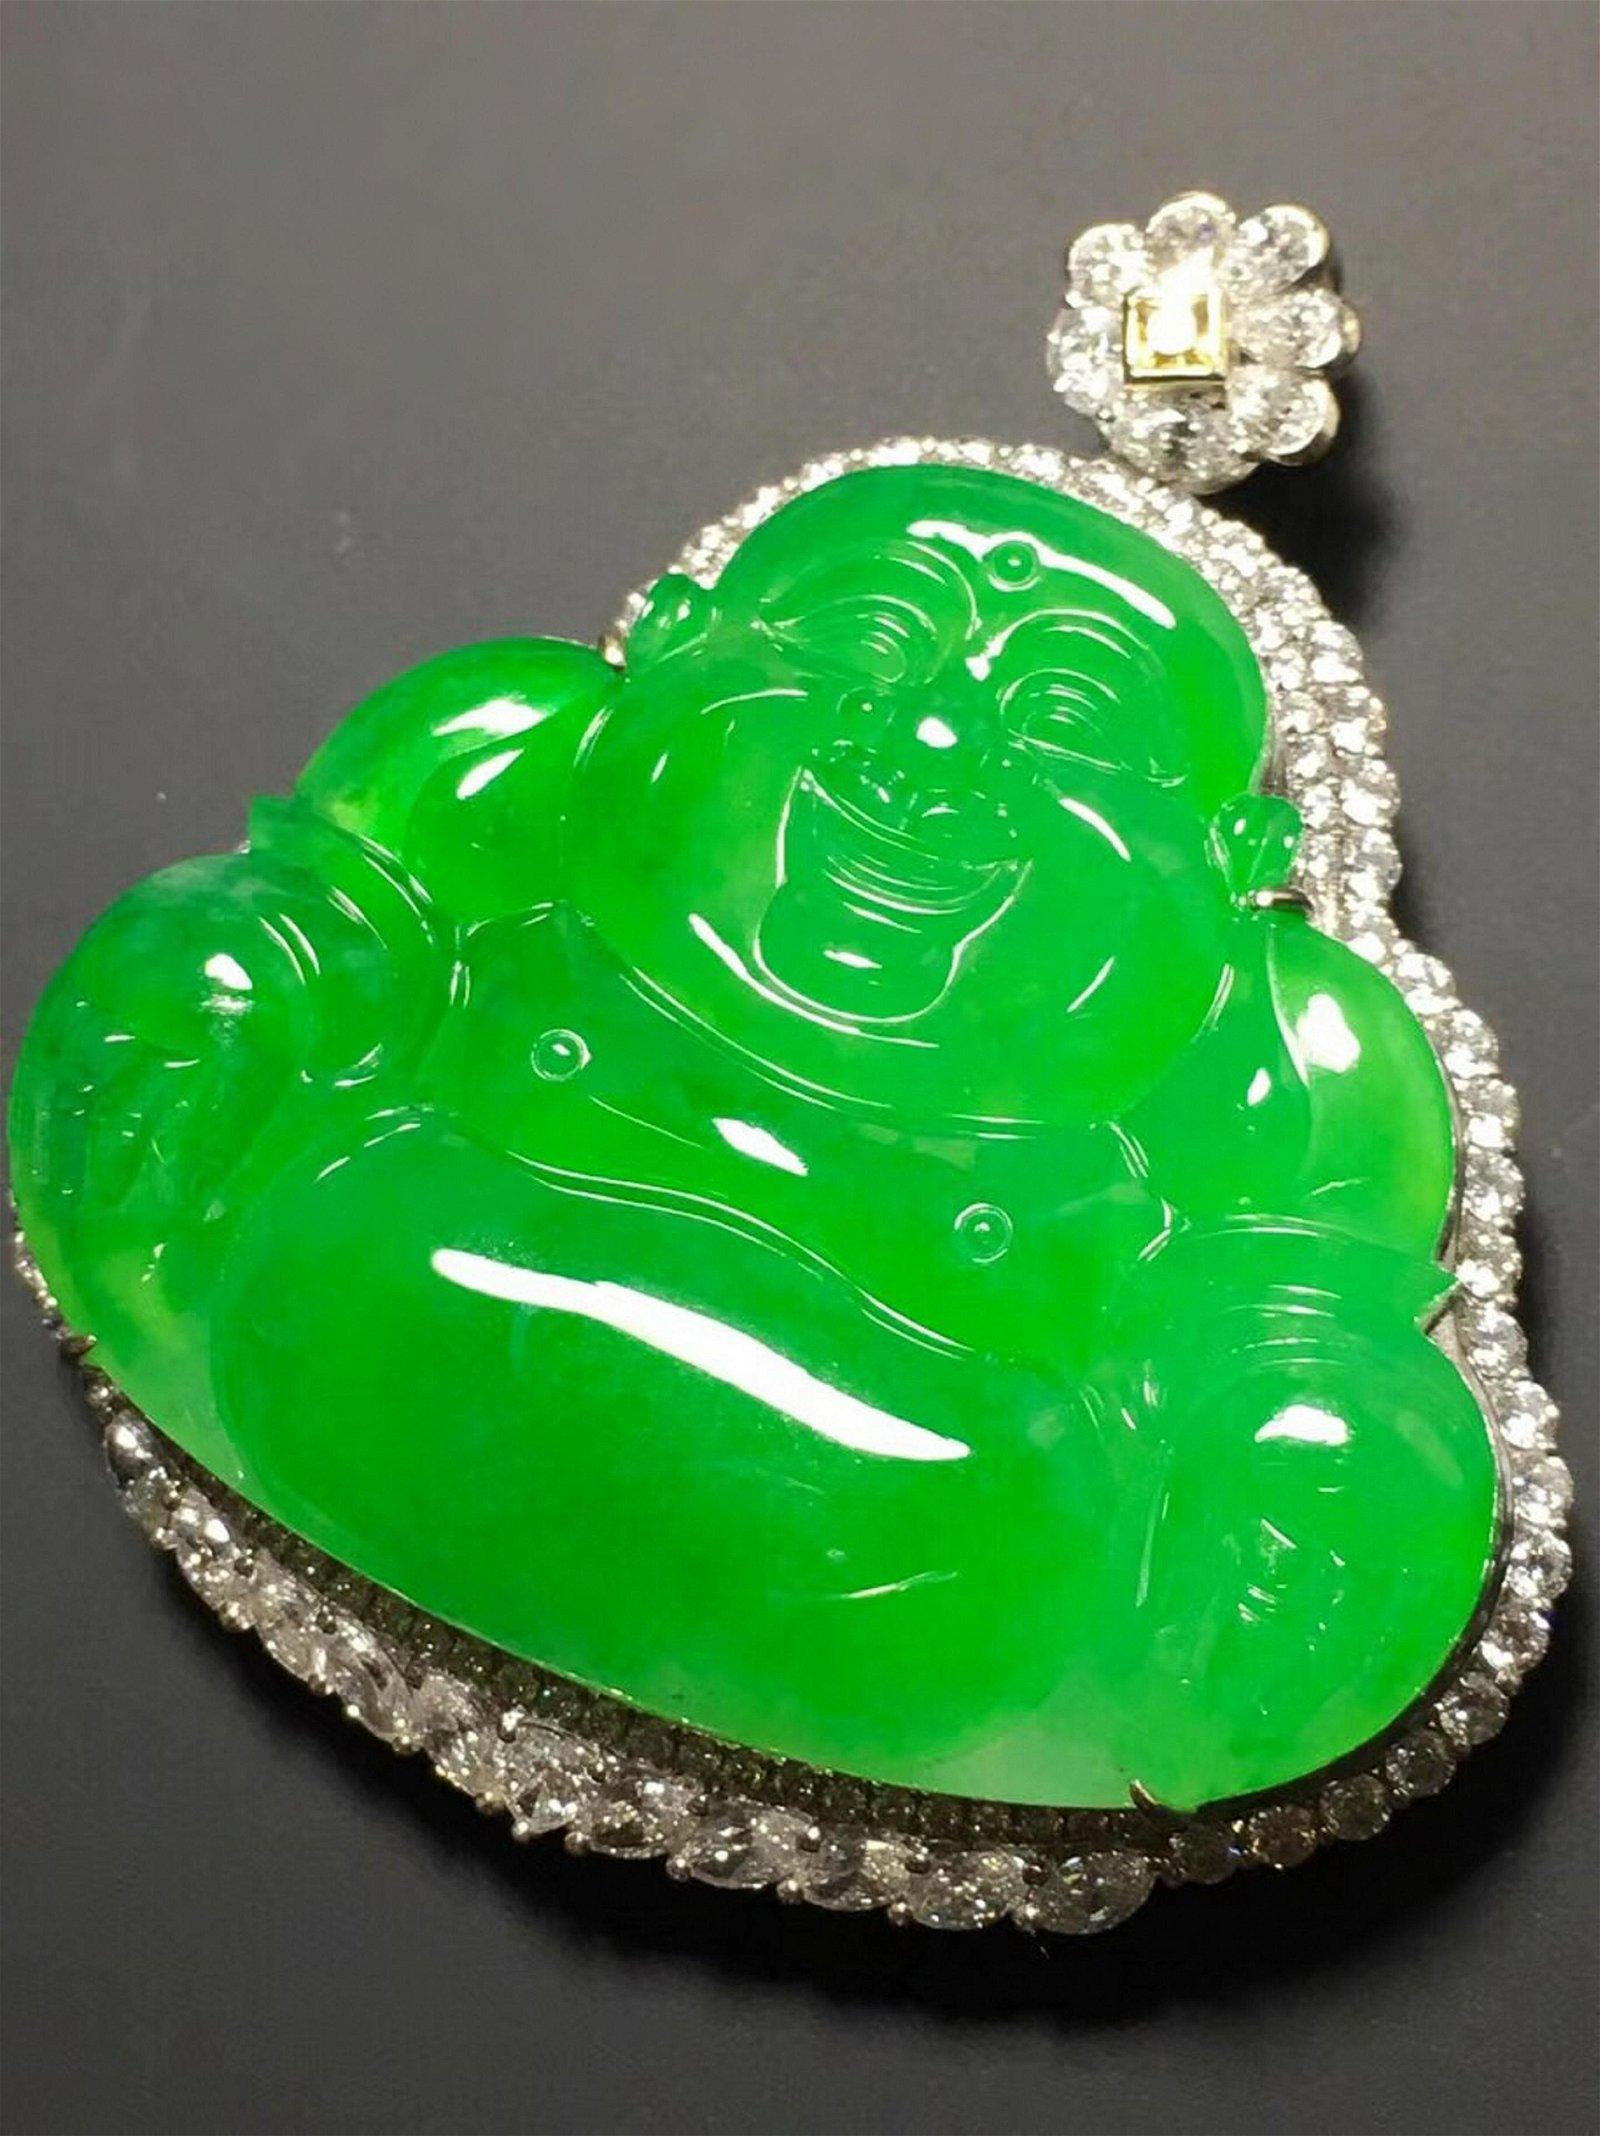 A GREEN JADEITE BUDDHA SHAPED PENDANT